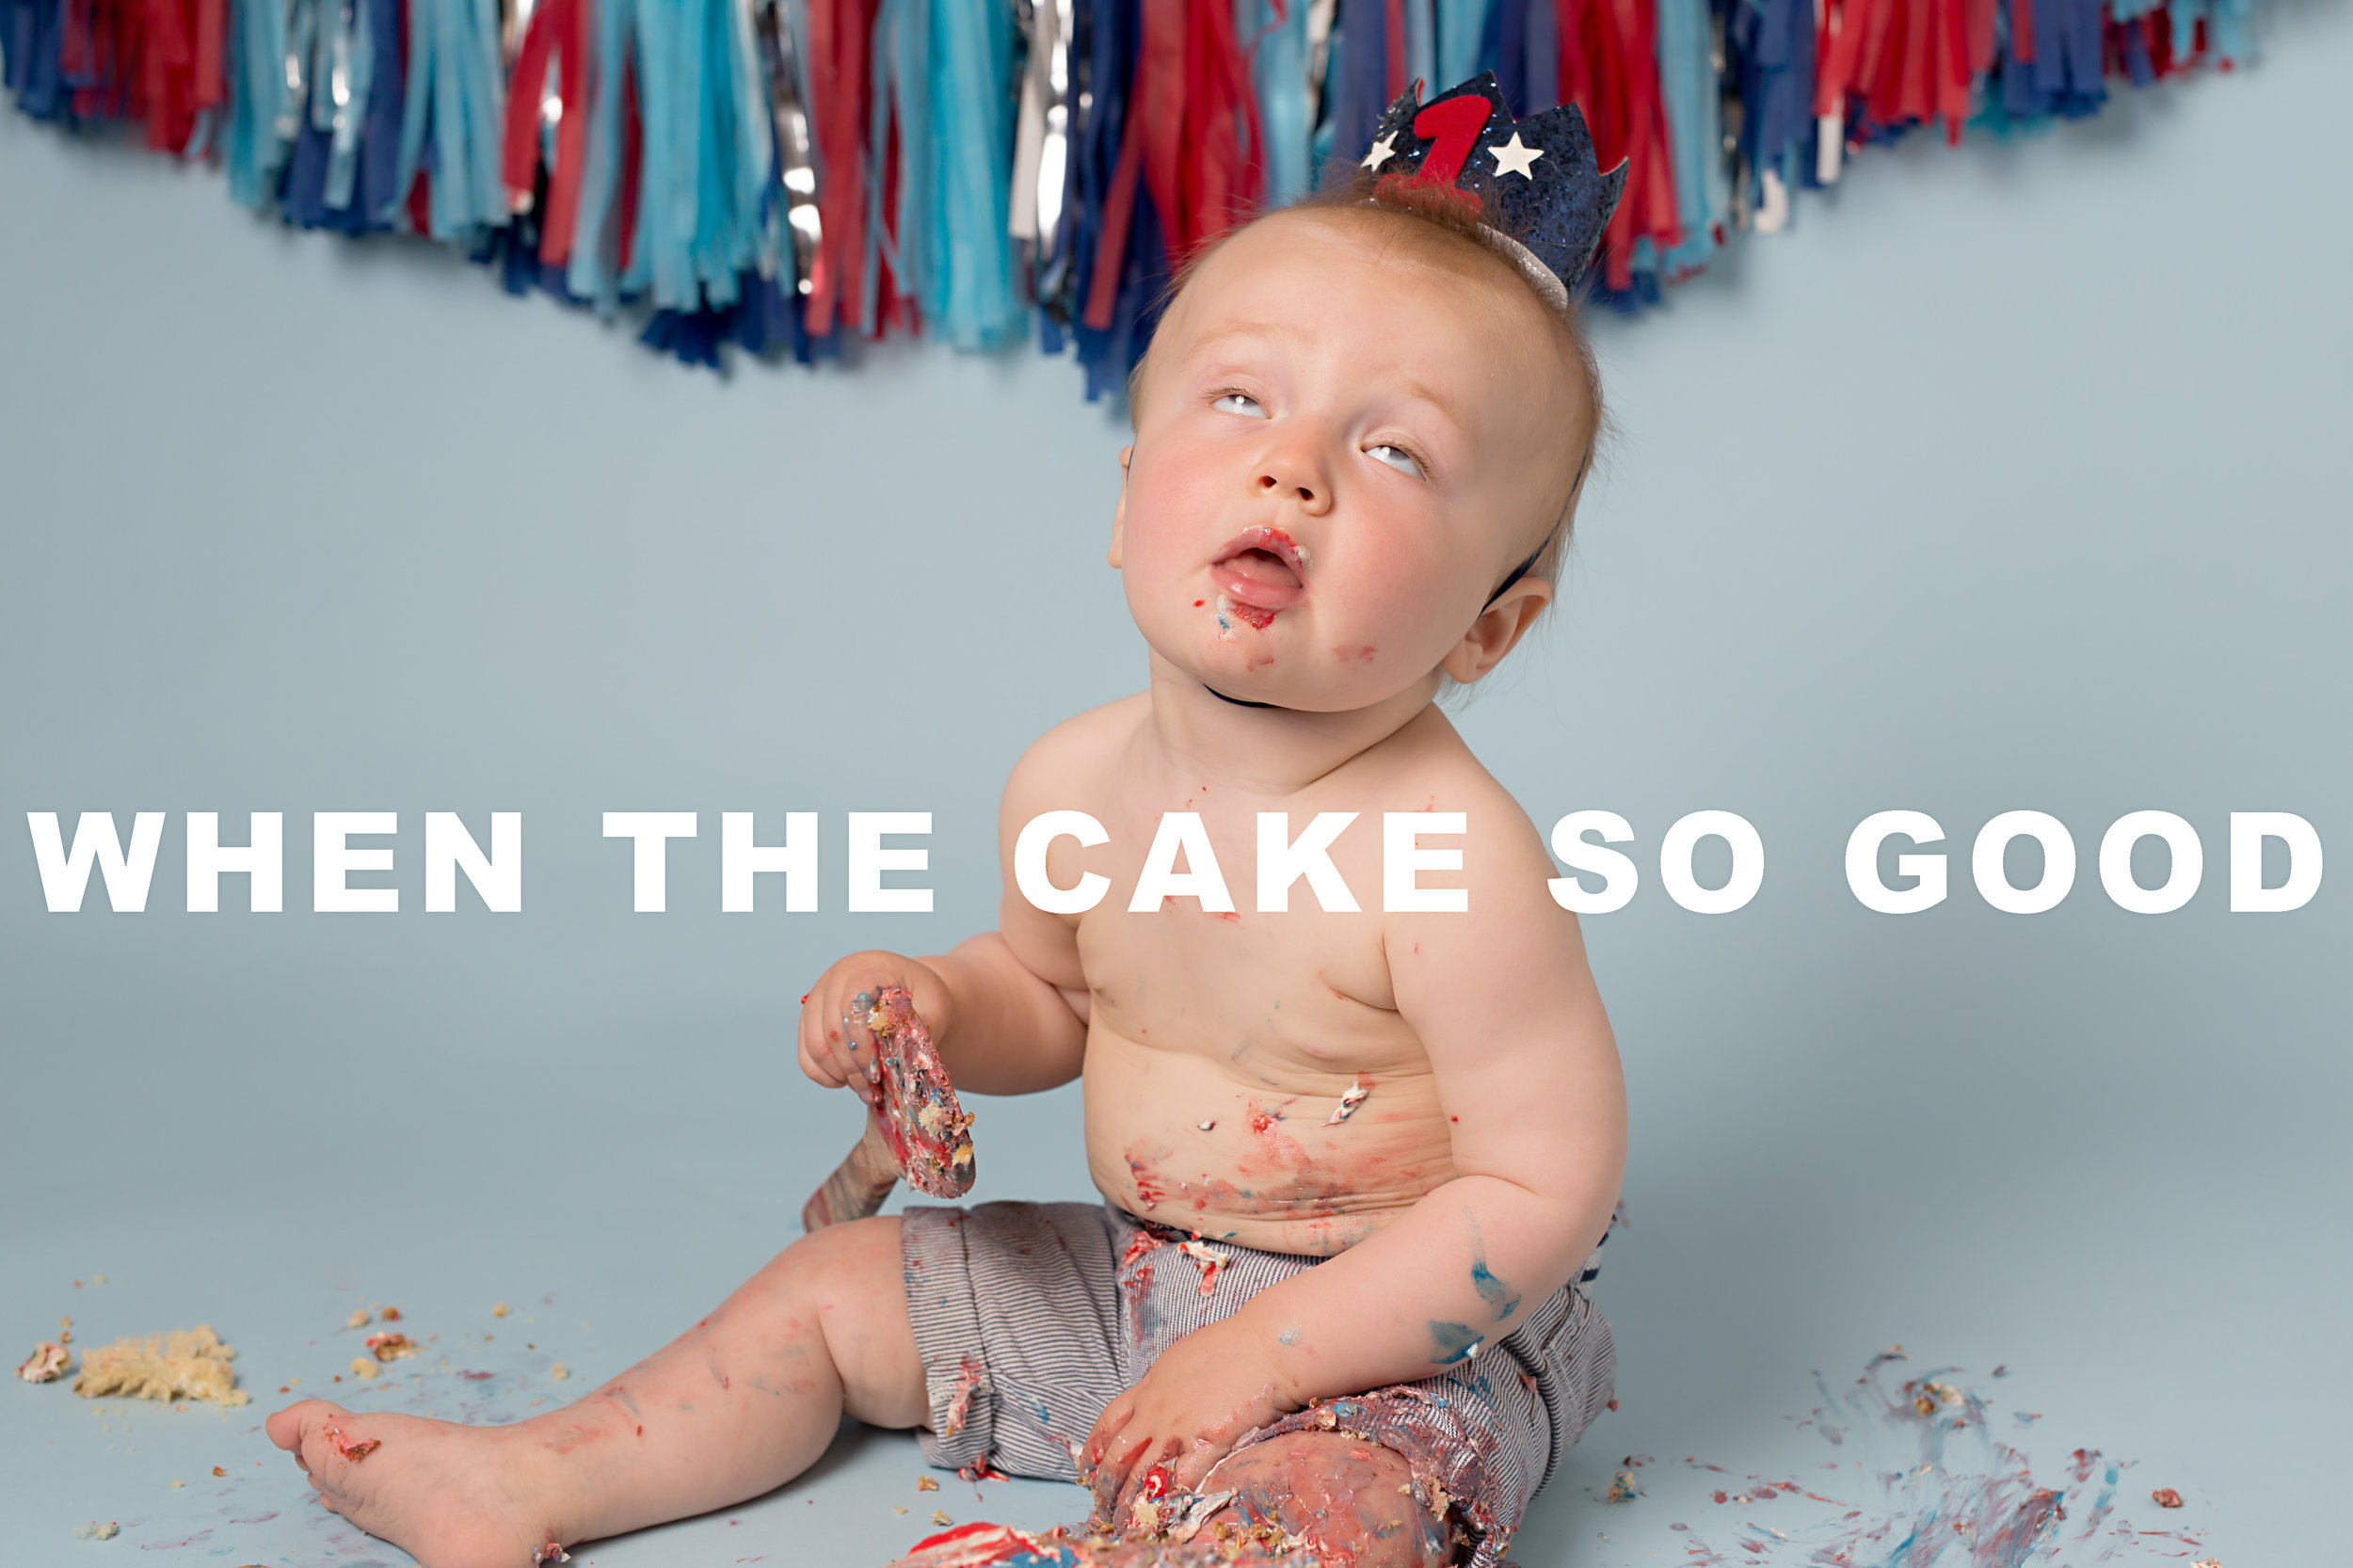 Evan meme cake good-170.jpg